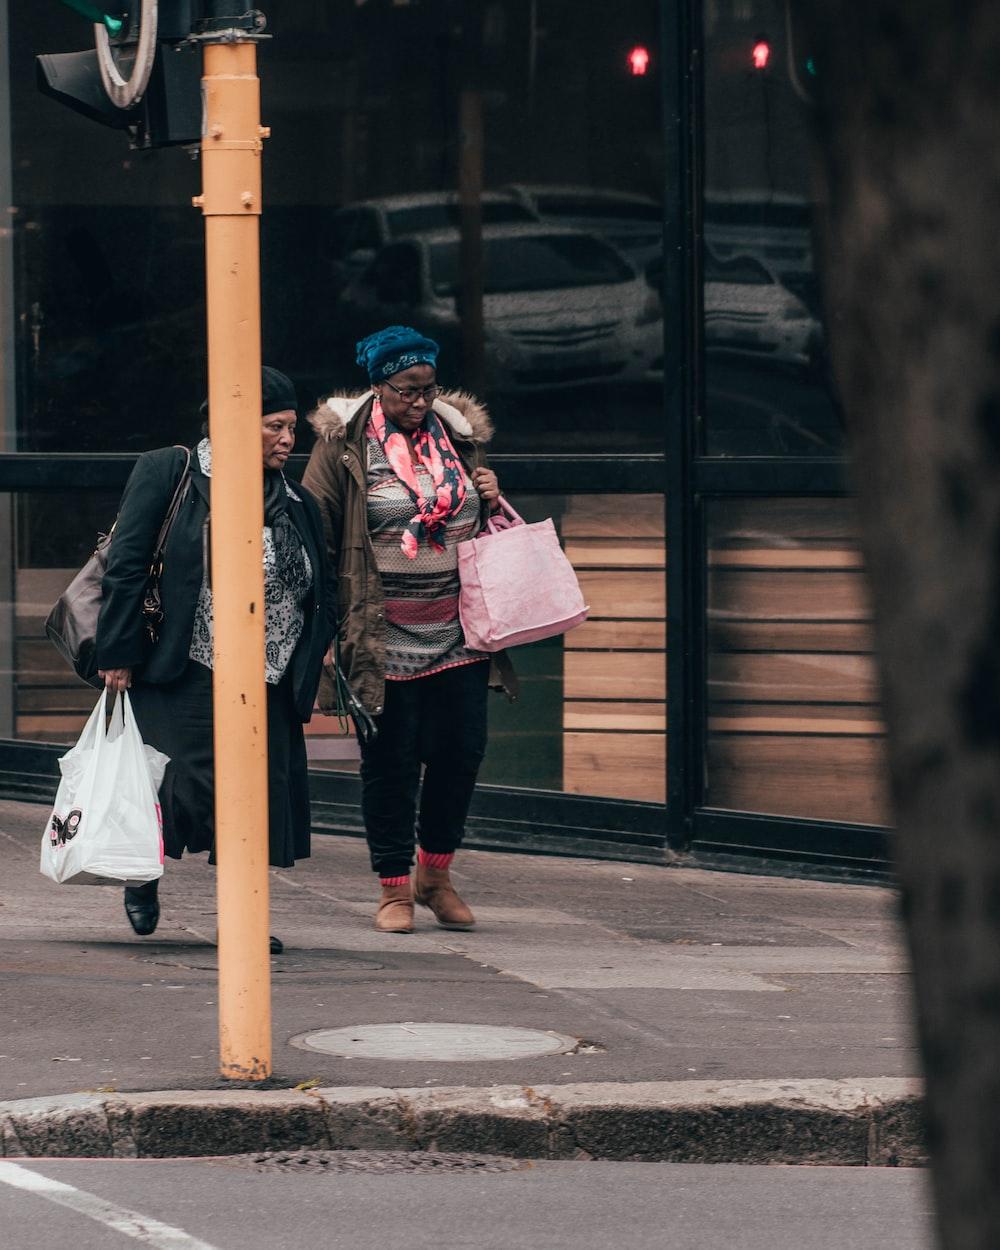 woman in black jacket and black pants carrying pink backpack walking on sidewalk during daytime